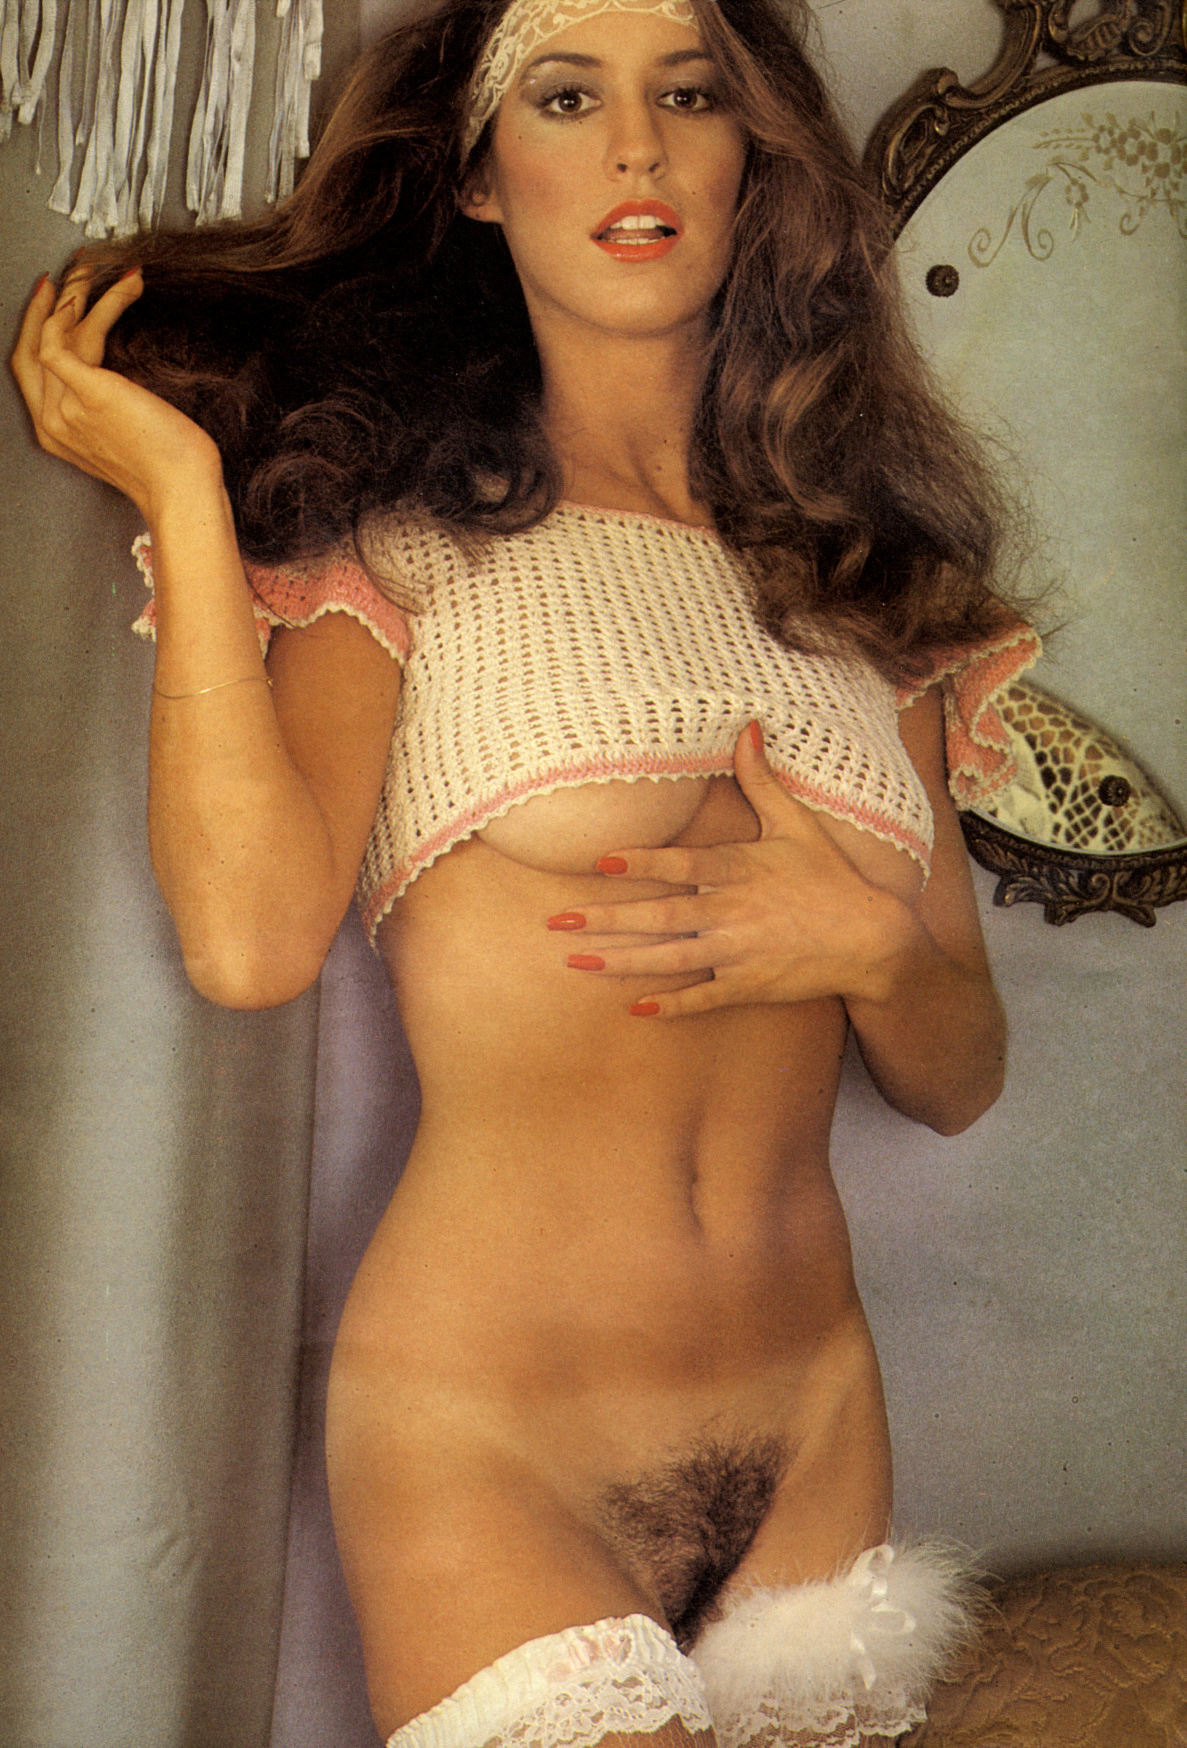 Pornstar Tina Ross aka Lauren Wilde 12.jpg